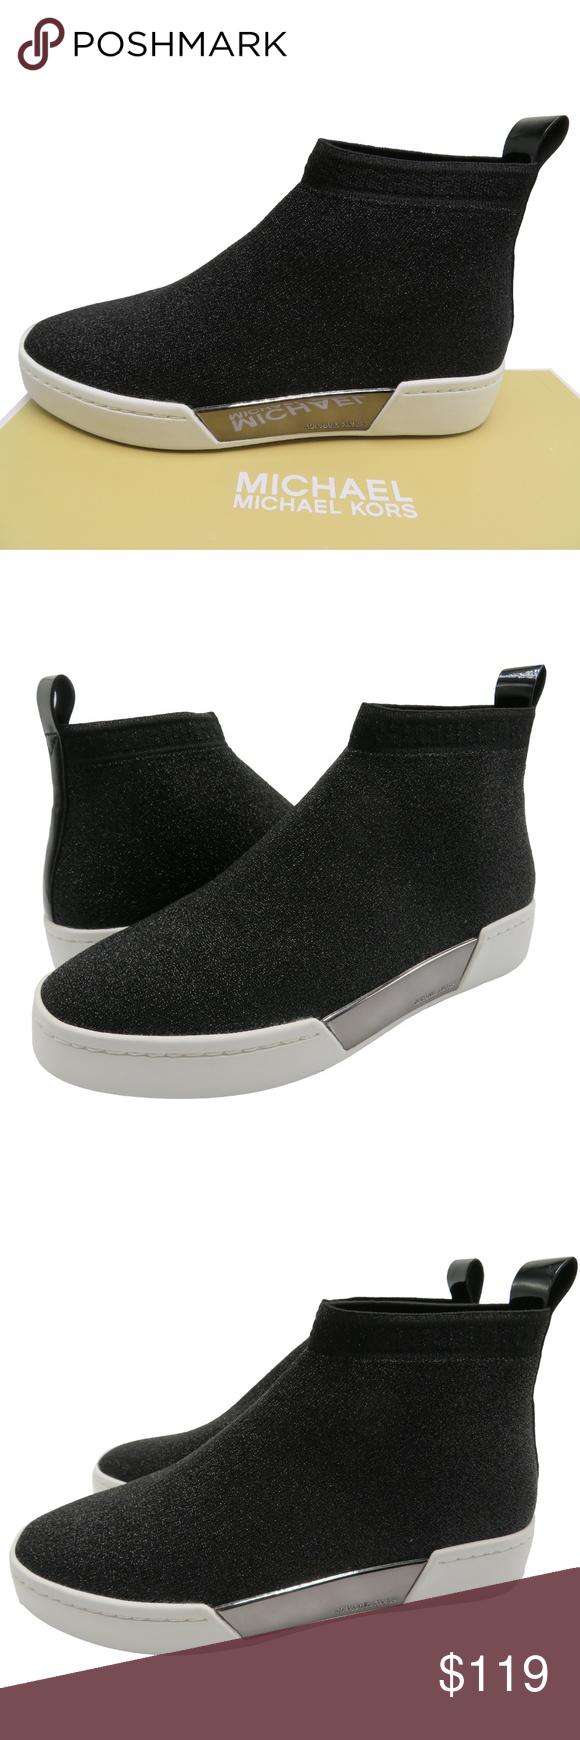 MICHAEL KORS GROVER Slip-On Sneakers Metallic MICHAEL KORS GROVER Slip-On Sneake…